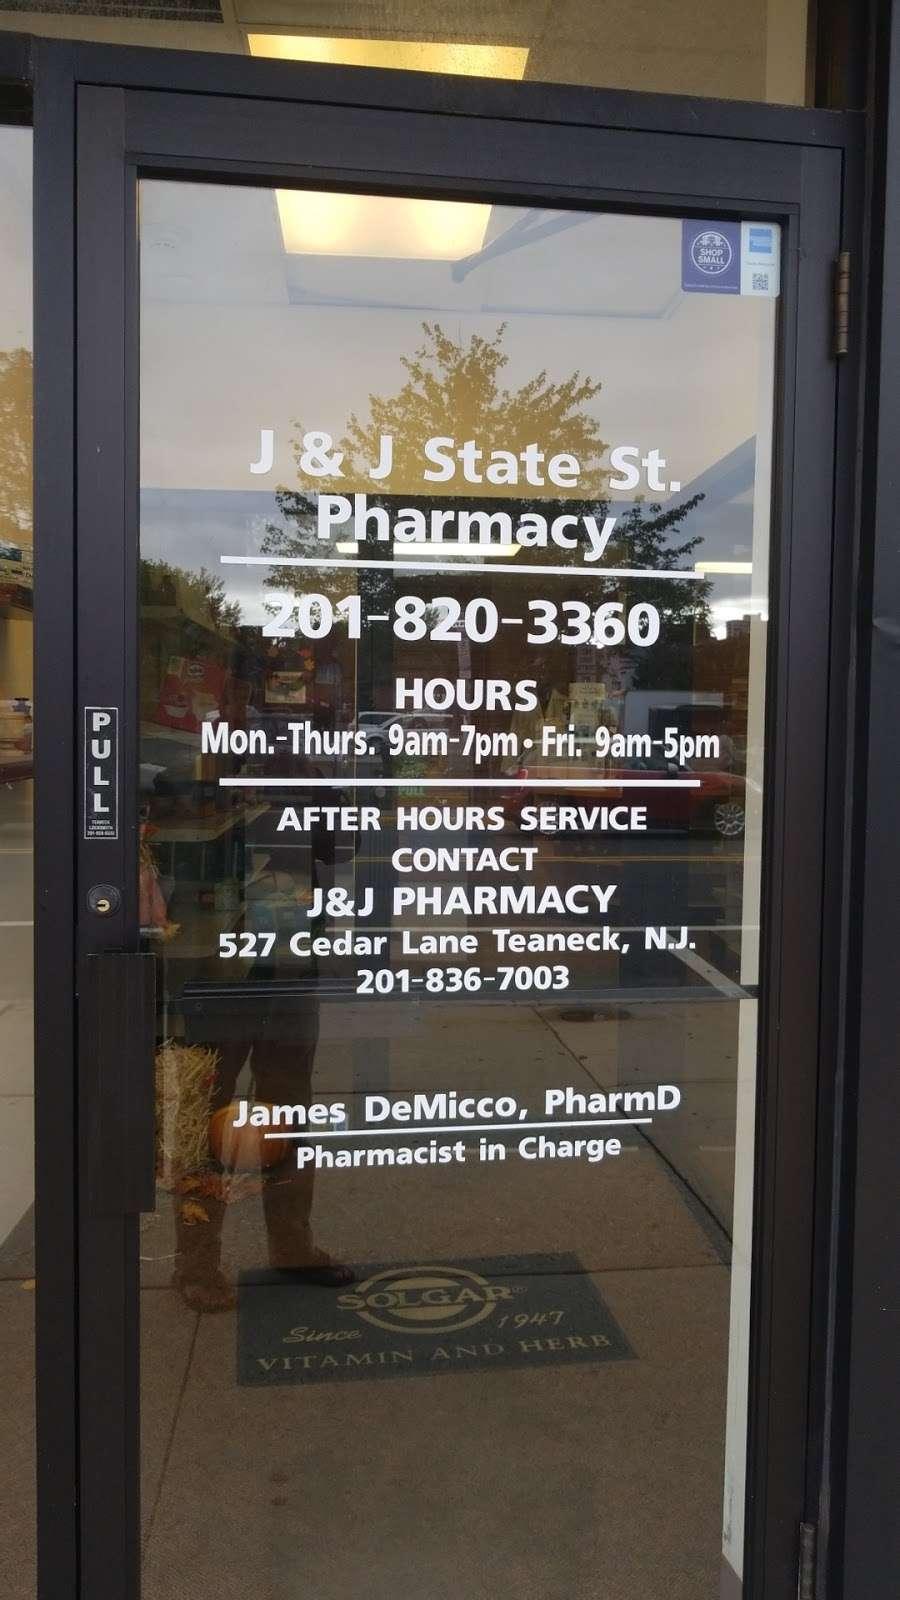 J&J Pharmacy - pharmacy  | Photo 2 of 2 | Address: 298 State St, Hackensack, NJ 07601, USA | Phone: (201) 820-3360